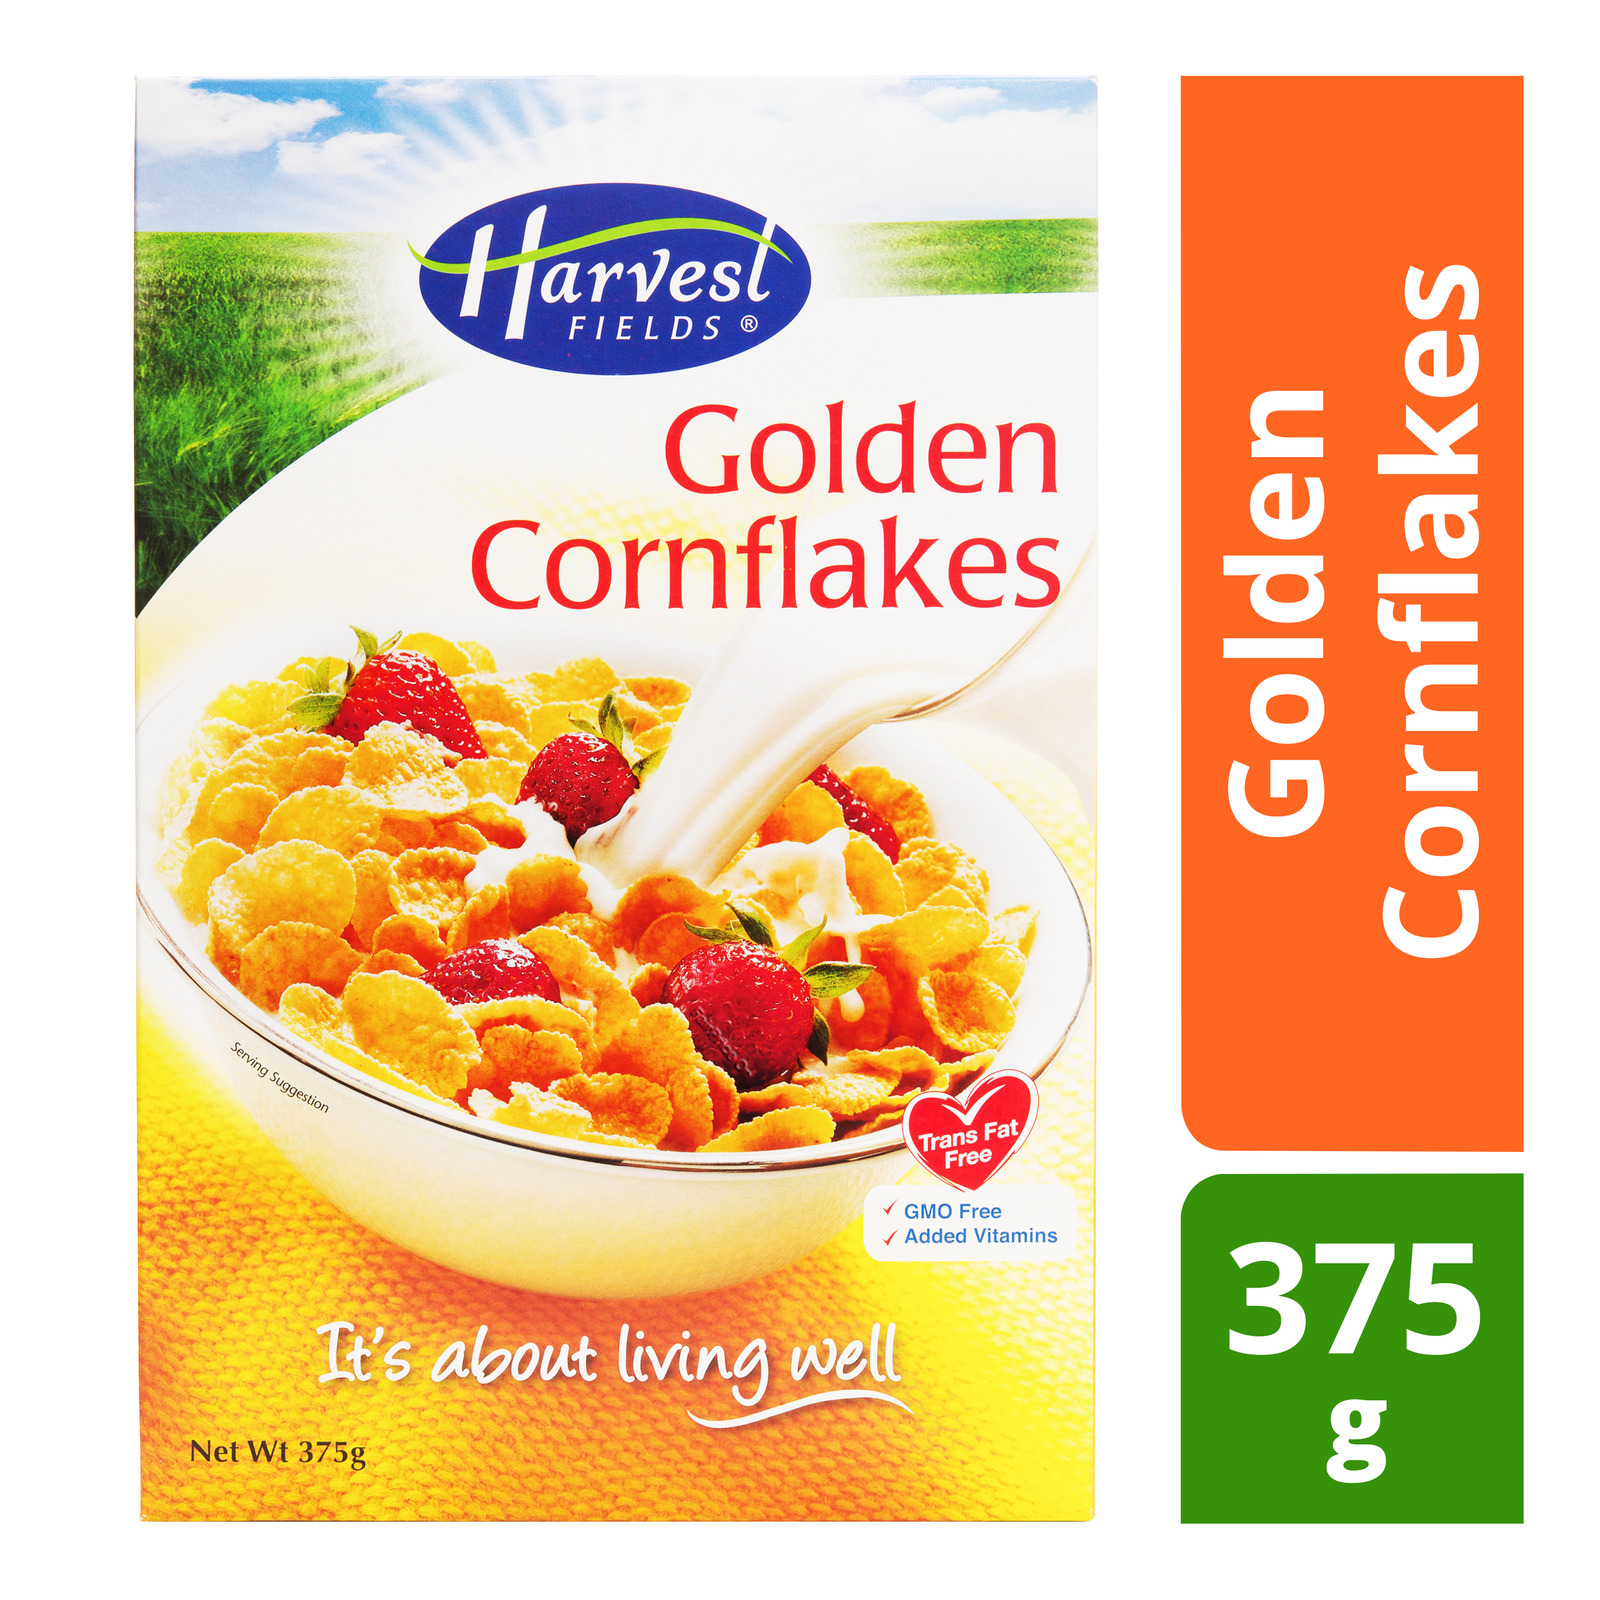 Harvest Fields Cereal - Golden Cornflakes